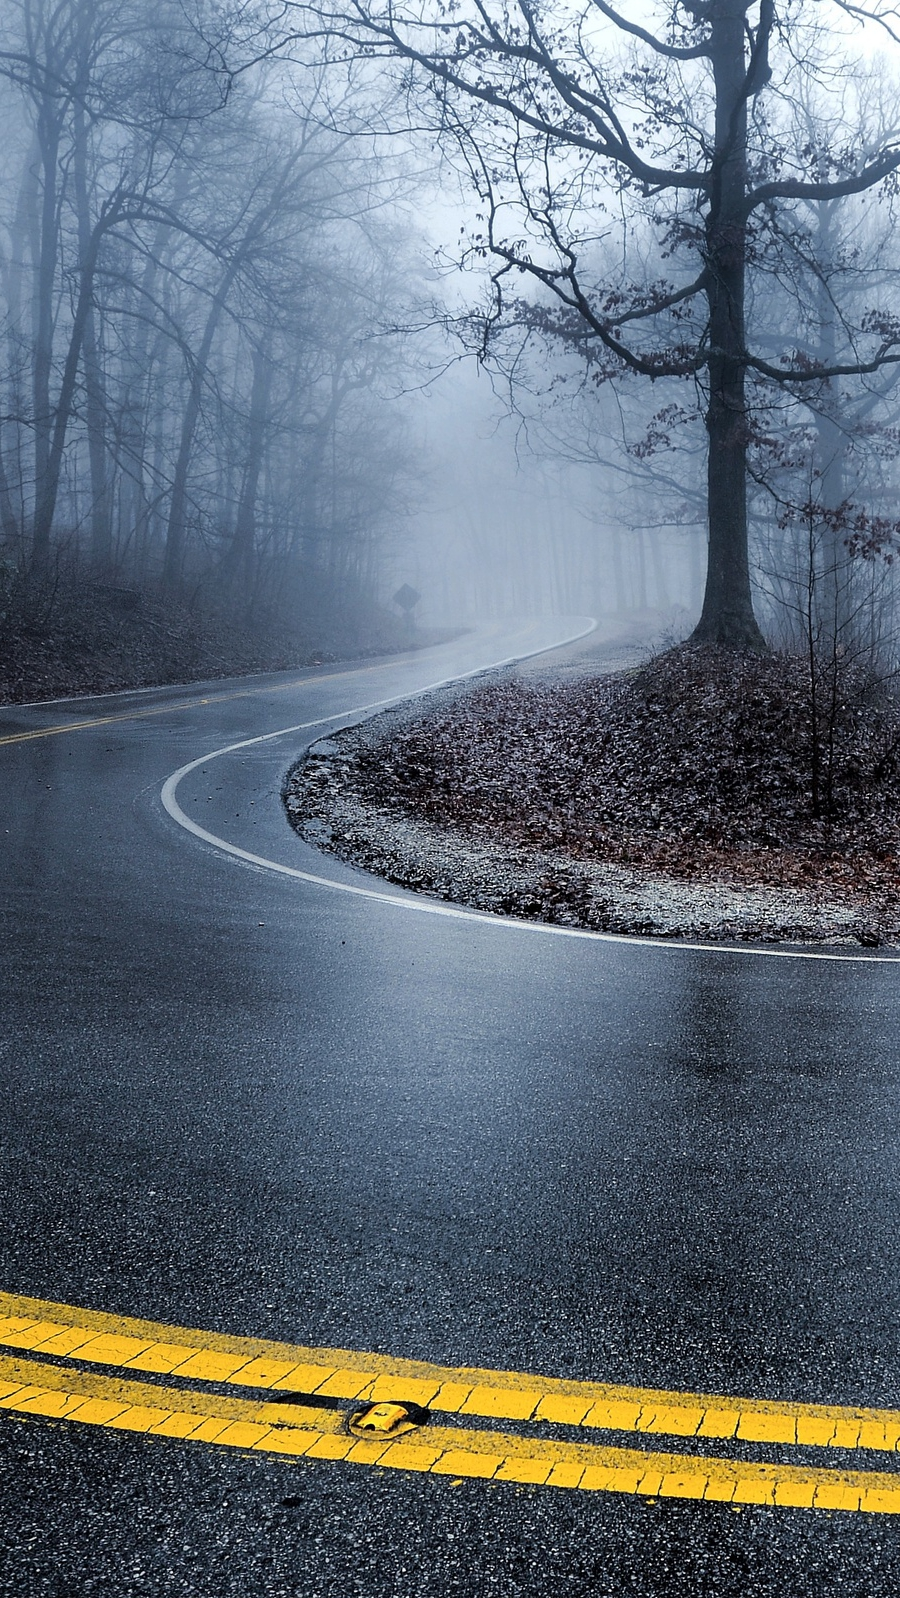 Road Winter Trees Fog iPhone Wallpaper iphoneswallpapers com